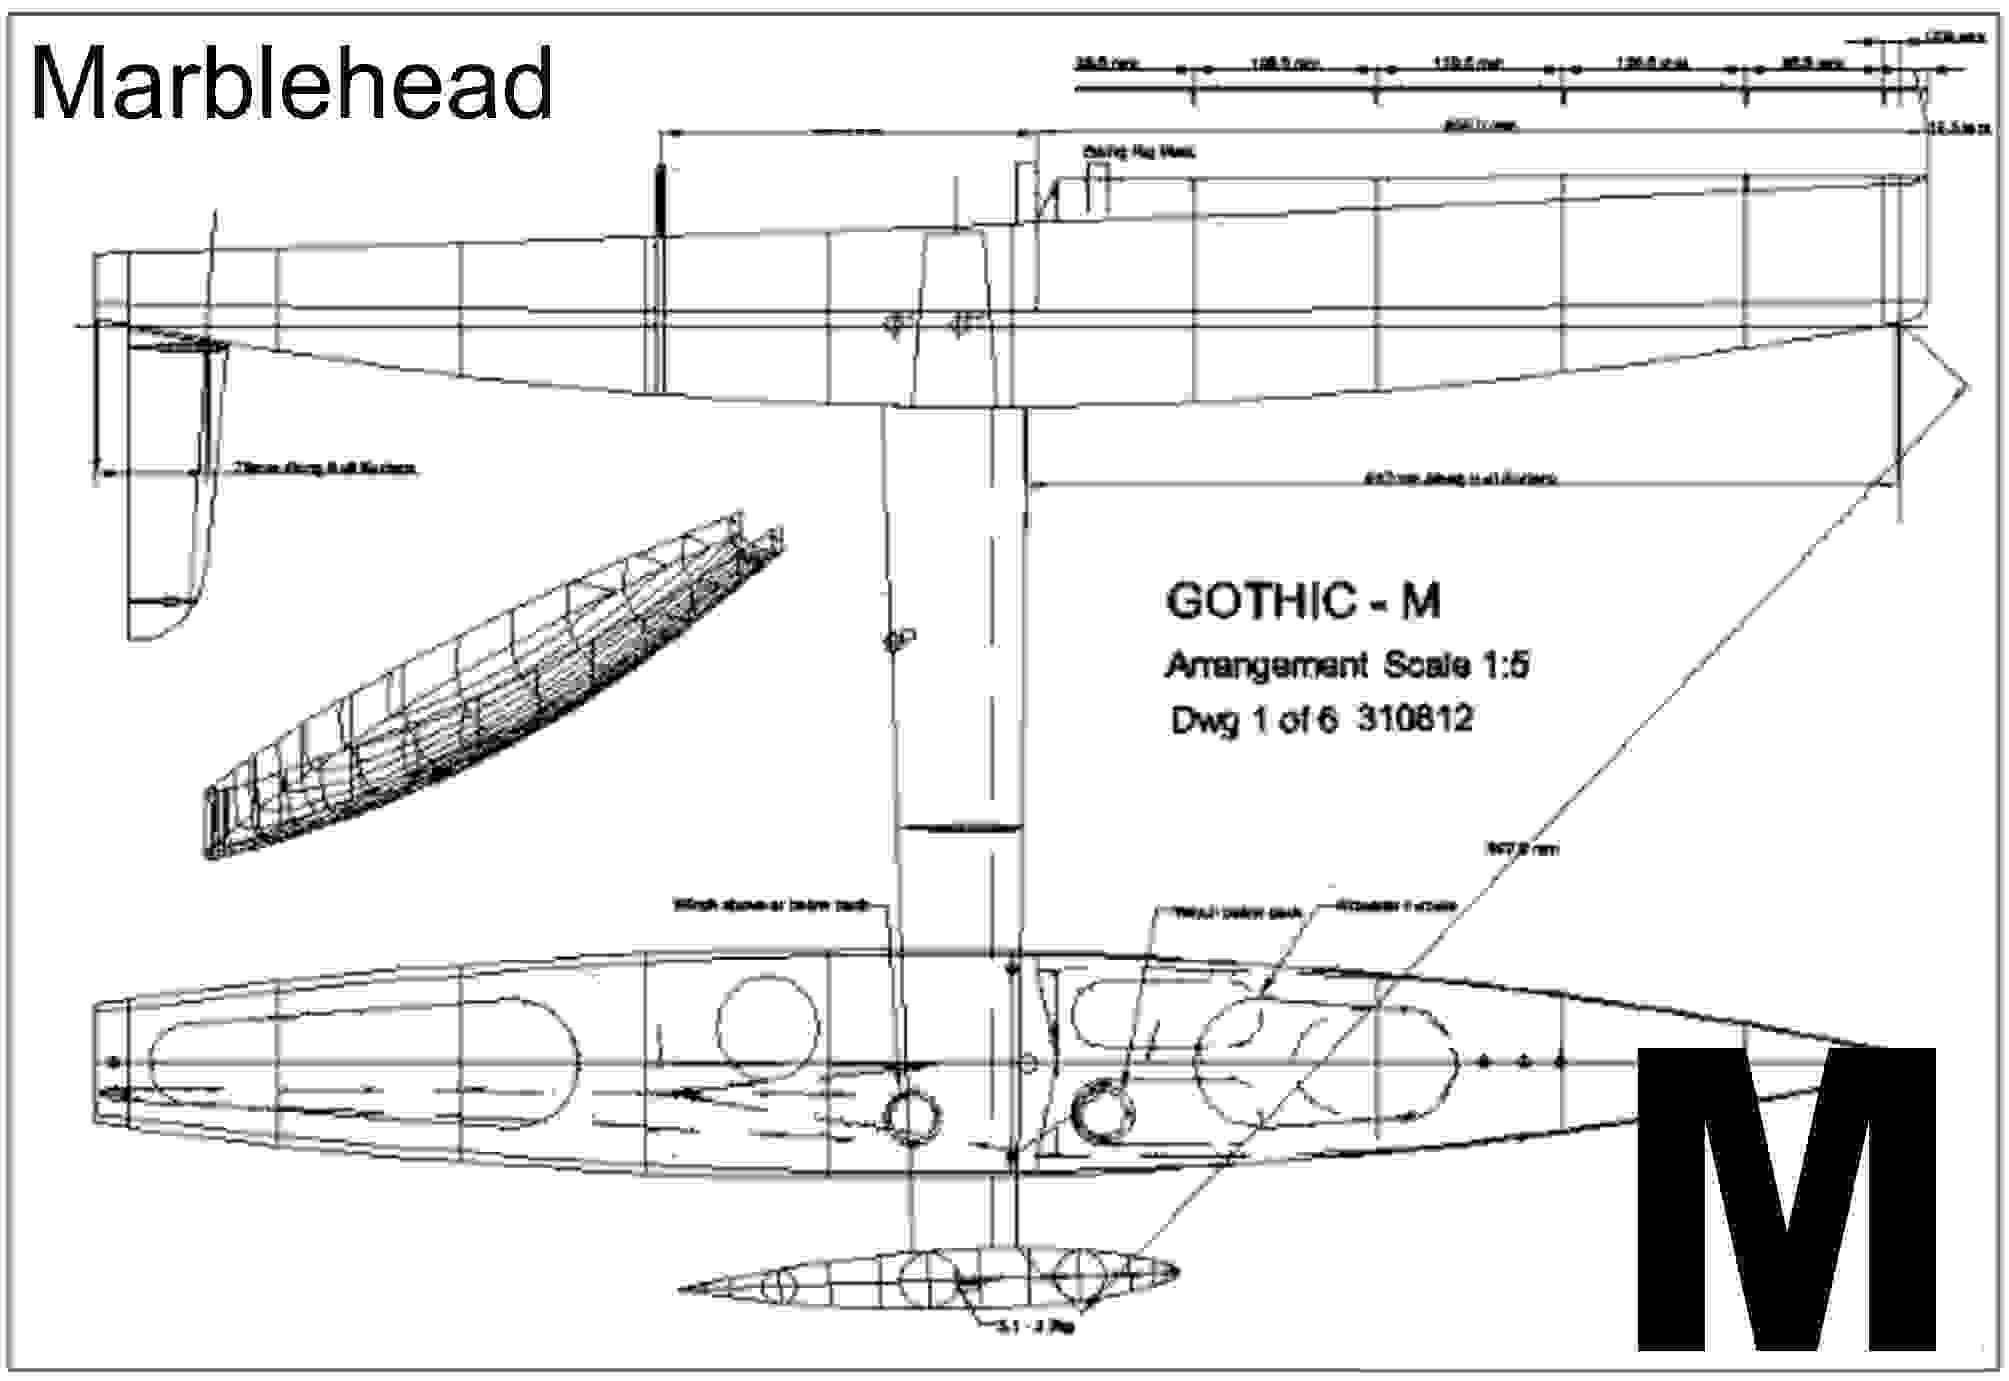 FP3 FREE PLANS for Marblehead - See details for weblinks ...